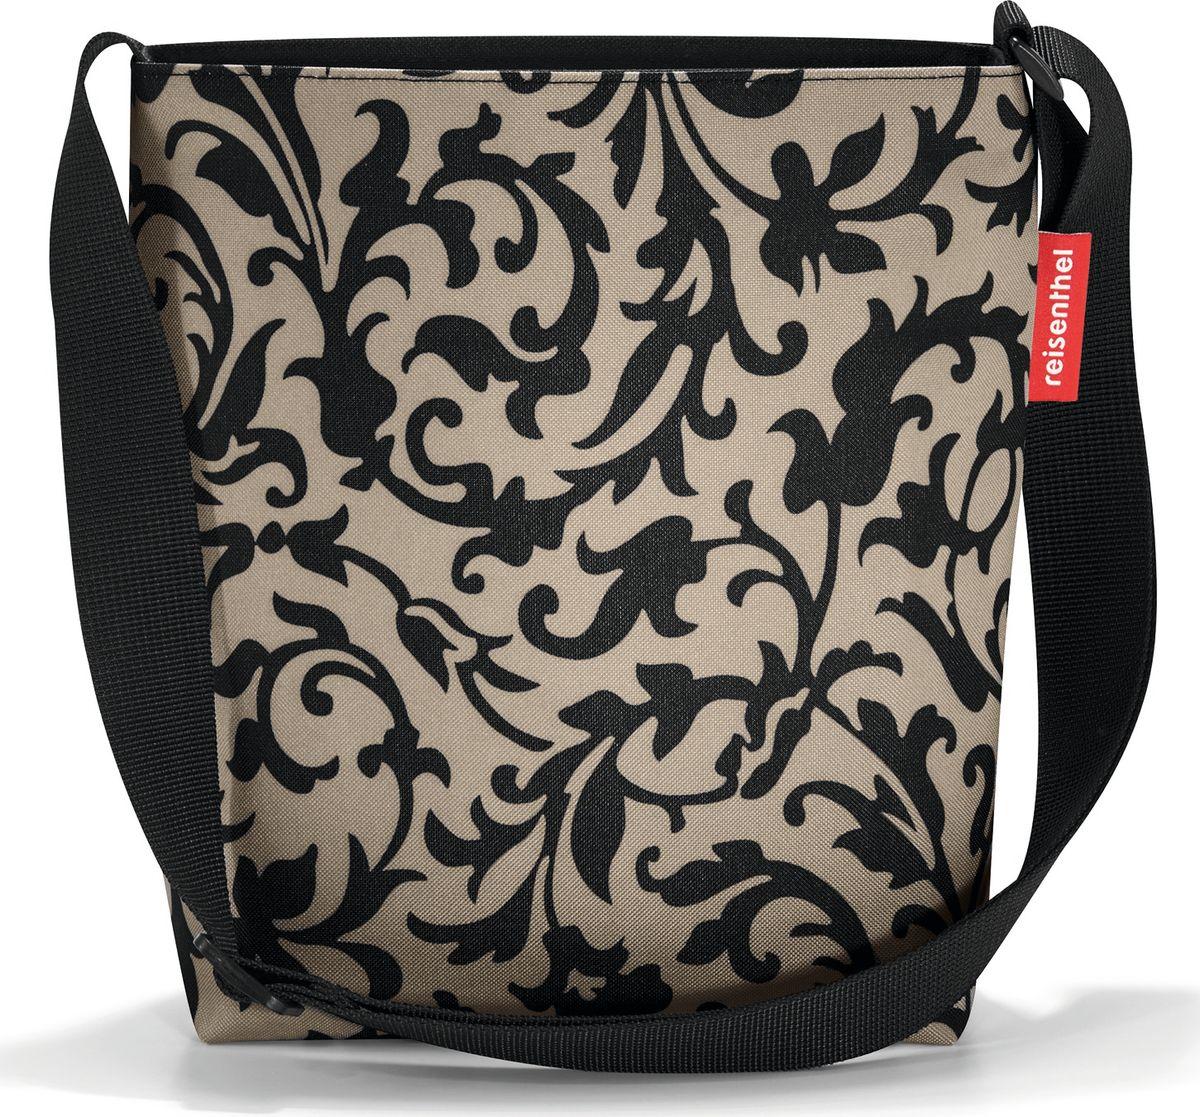 Сумка женская Reisenthel Shoulderbag S, цвет: бежевый, черный. HY7027 сумка женская reisenthel цвет бежевый черный ms7027